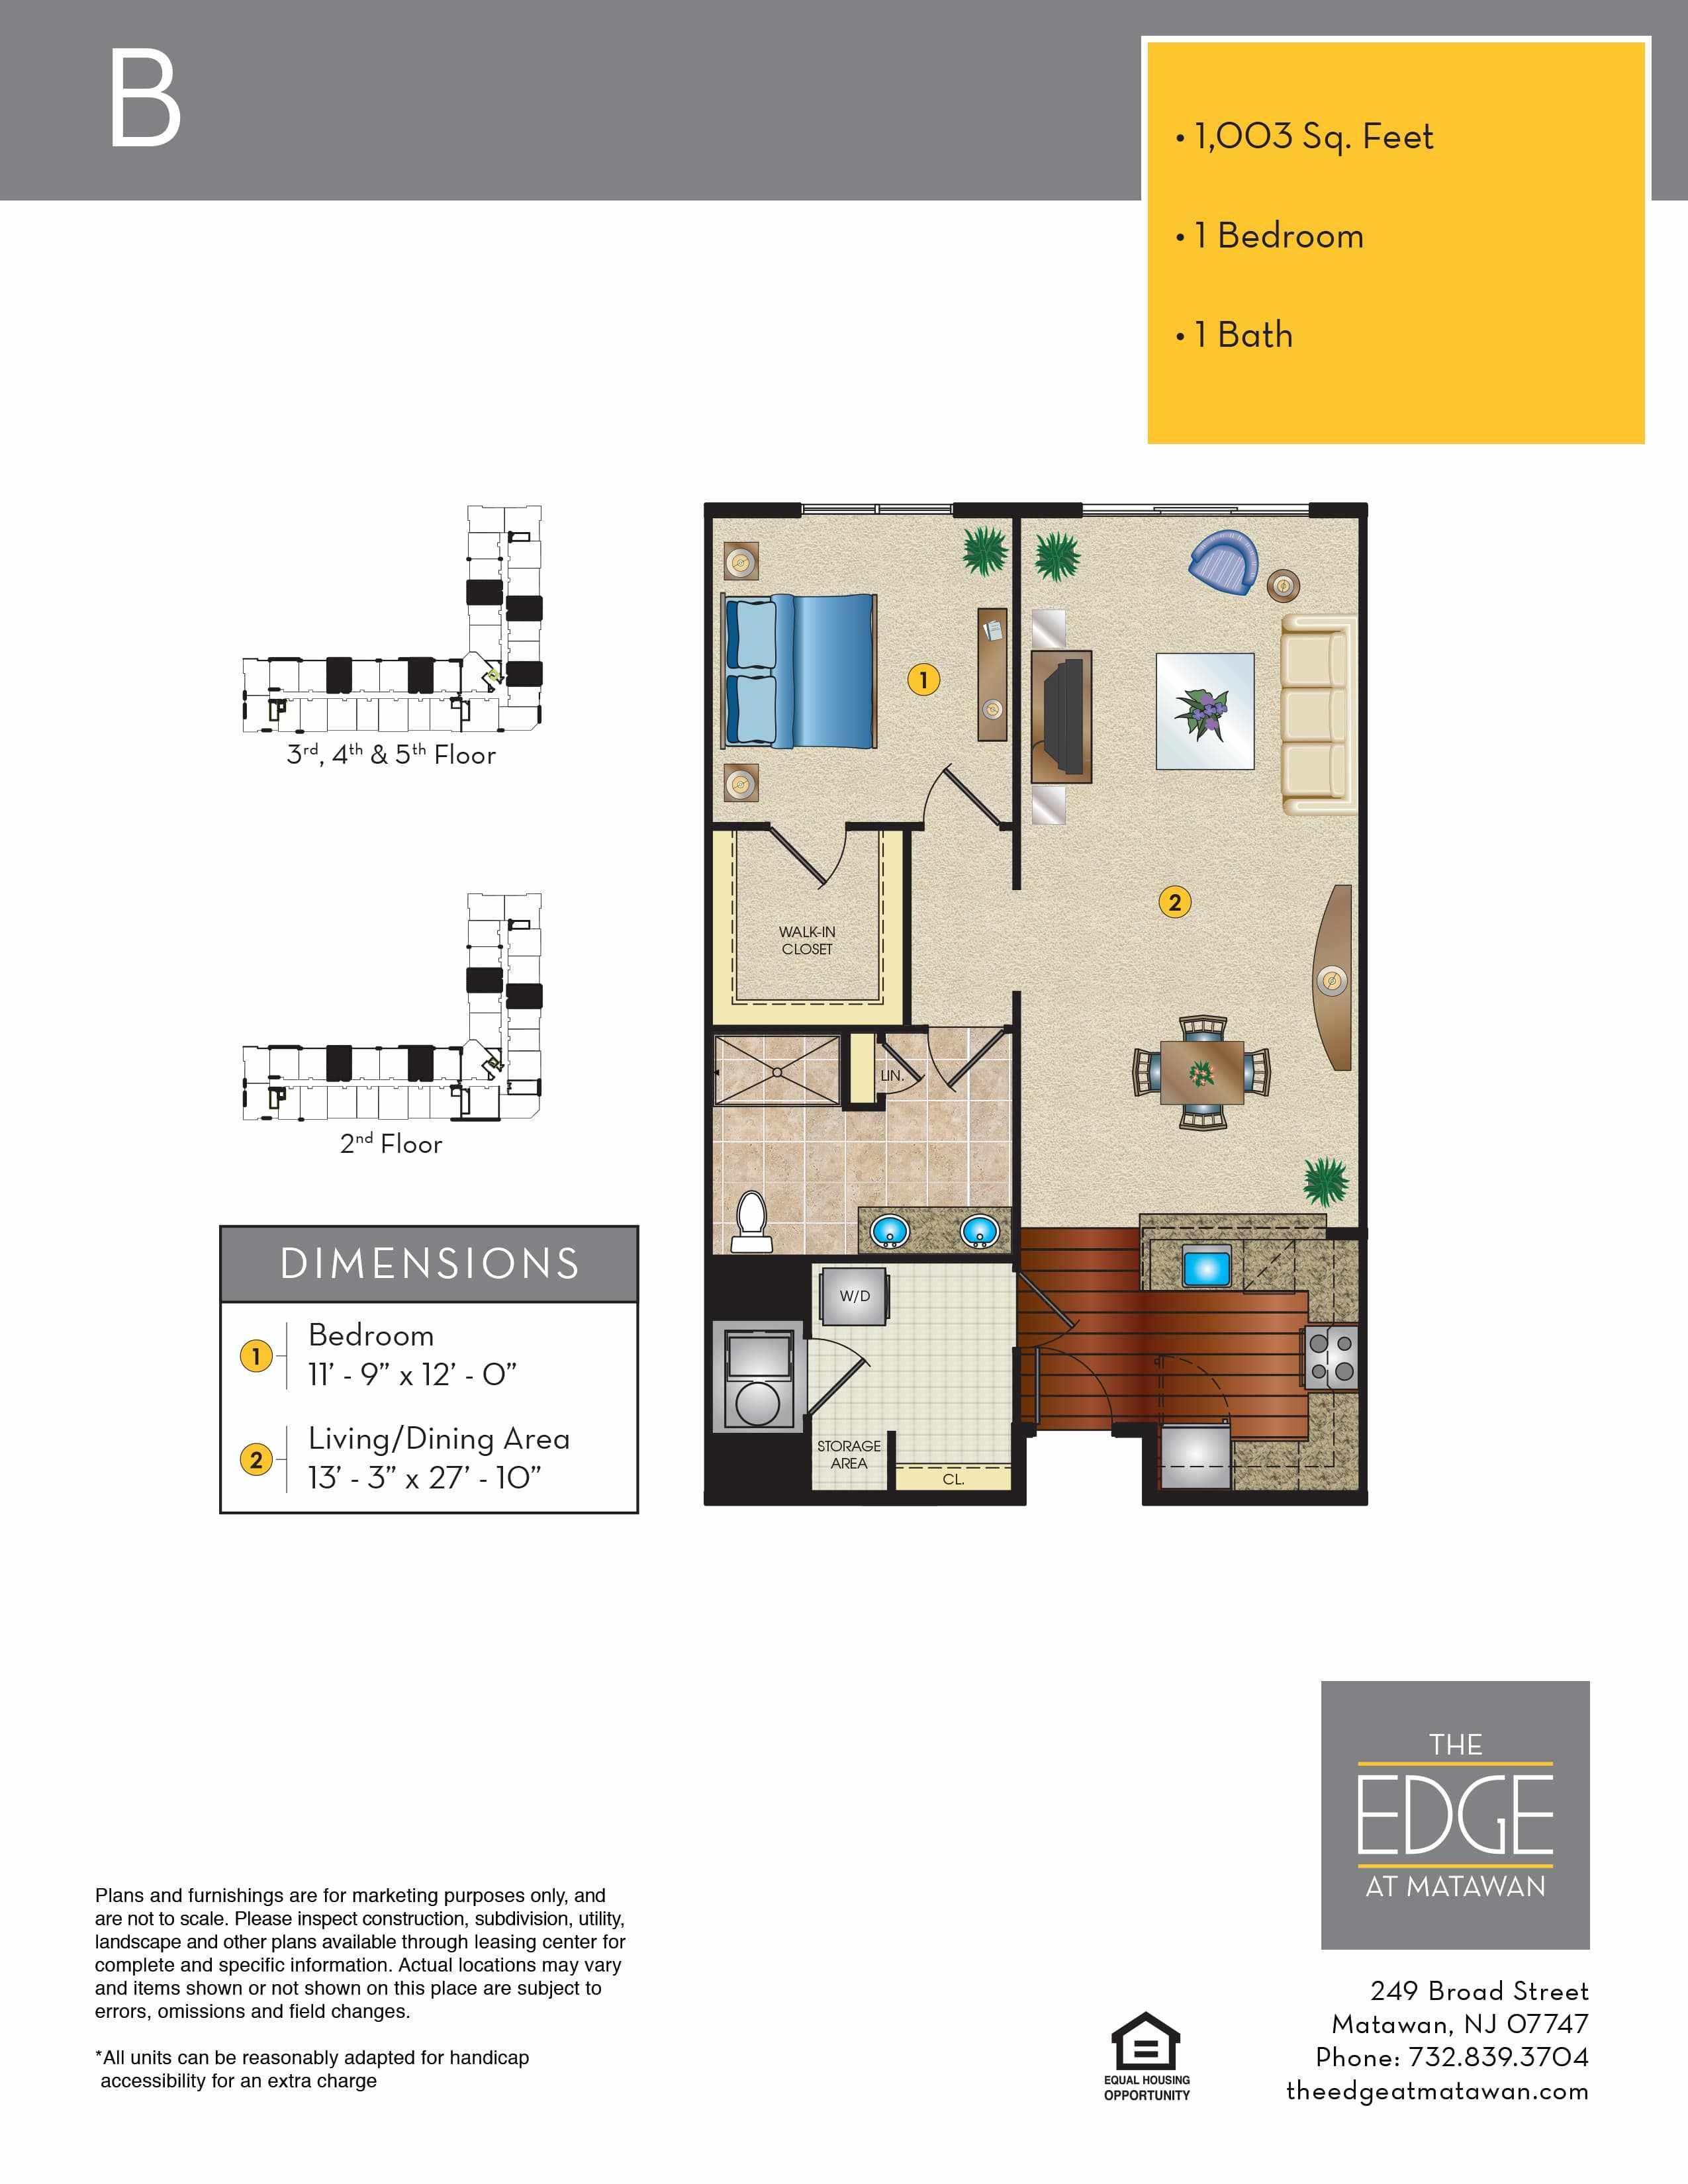 B Floor Plan